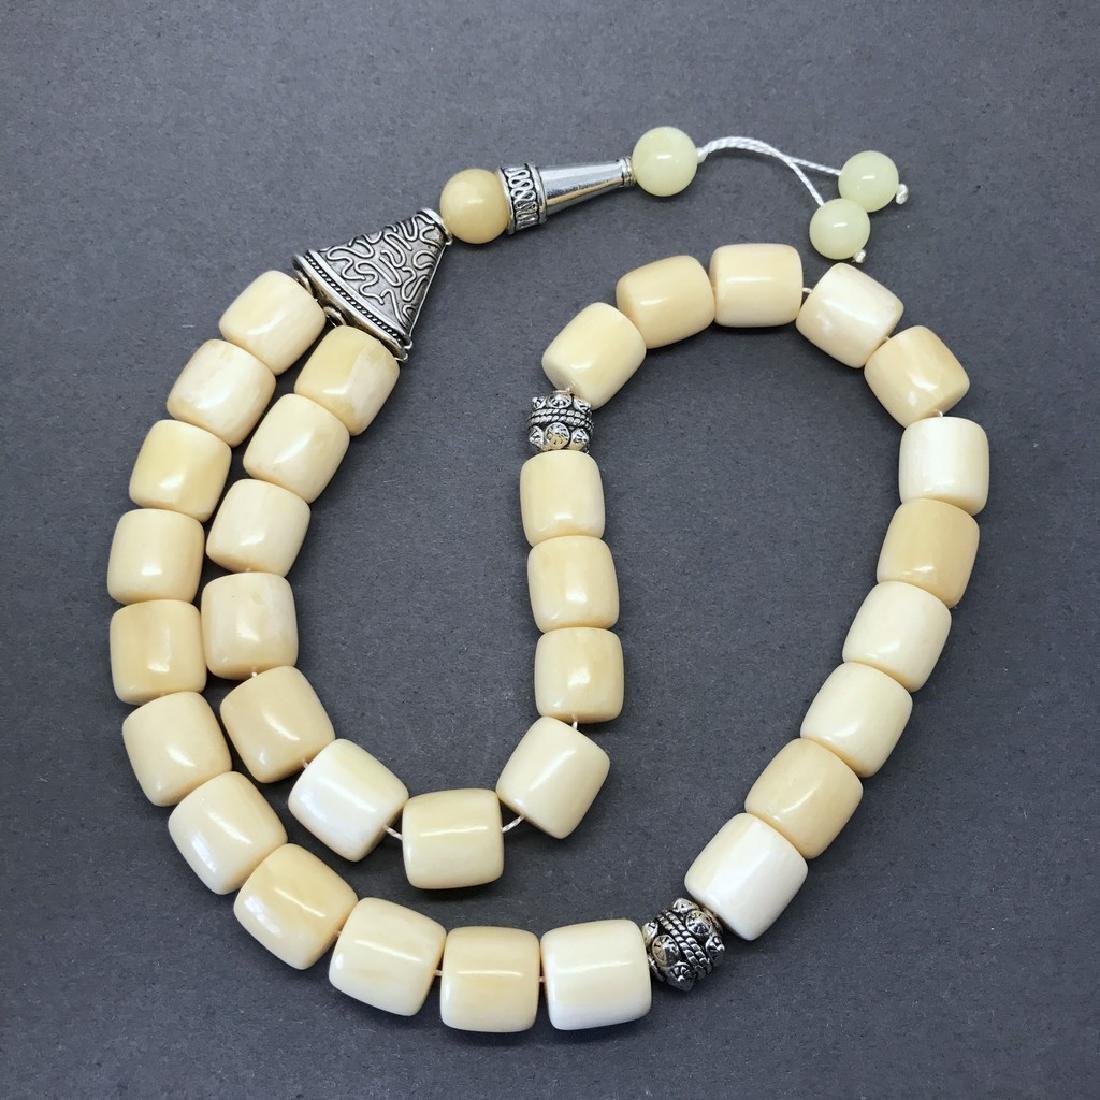 Tesbih rosary 33 Baltic amber beads barrel 12x13mm 75